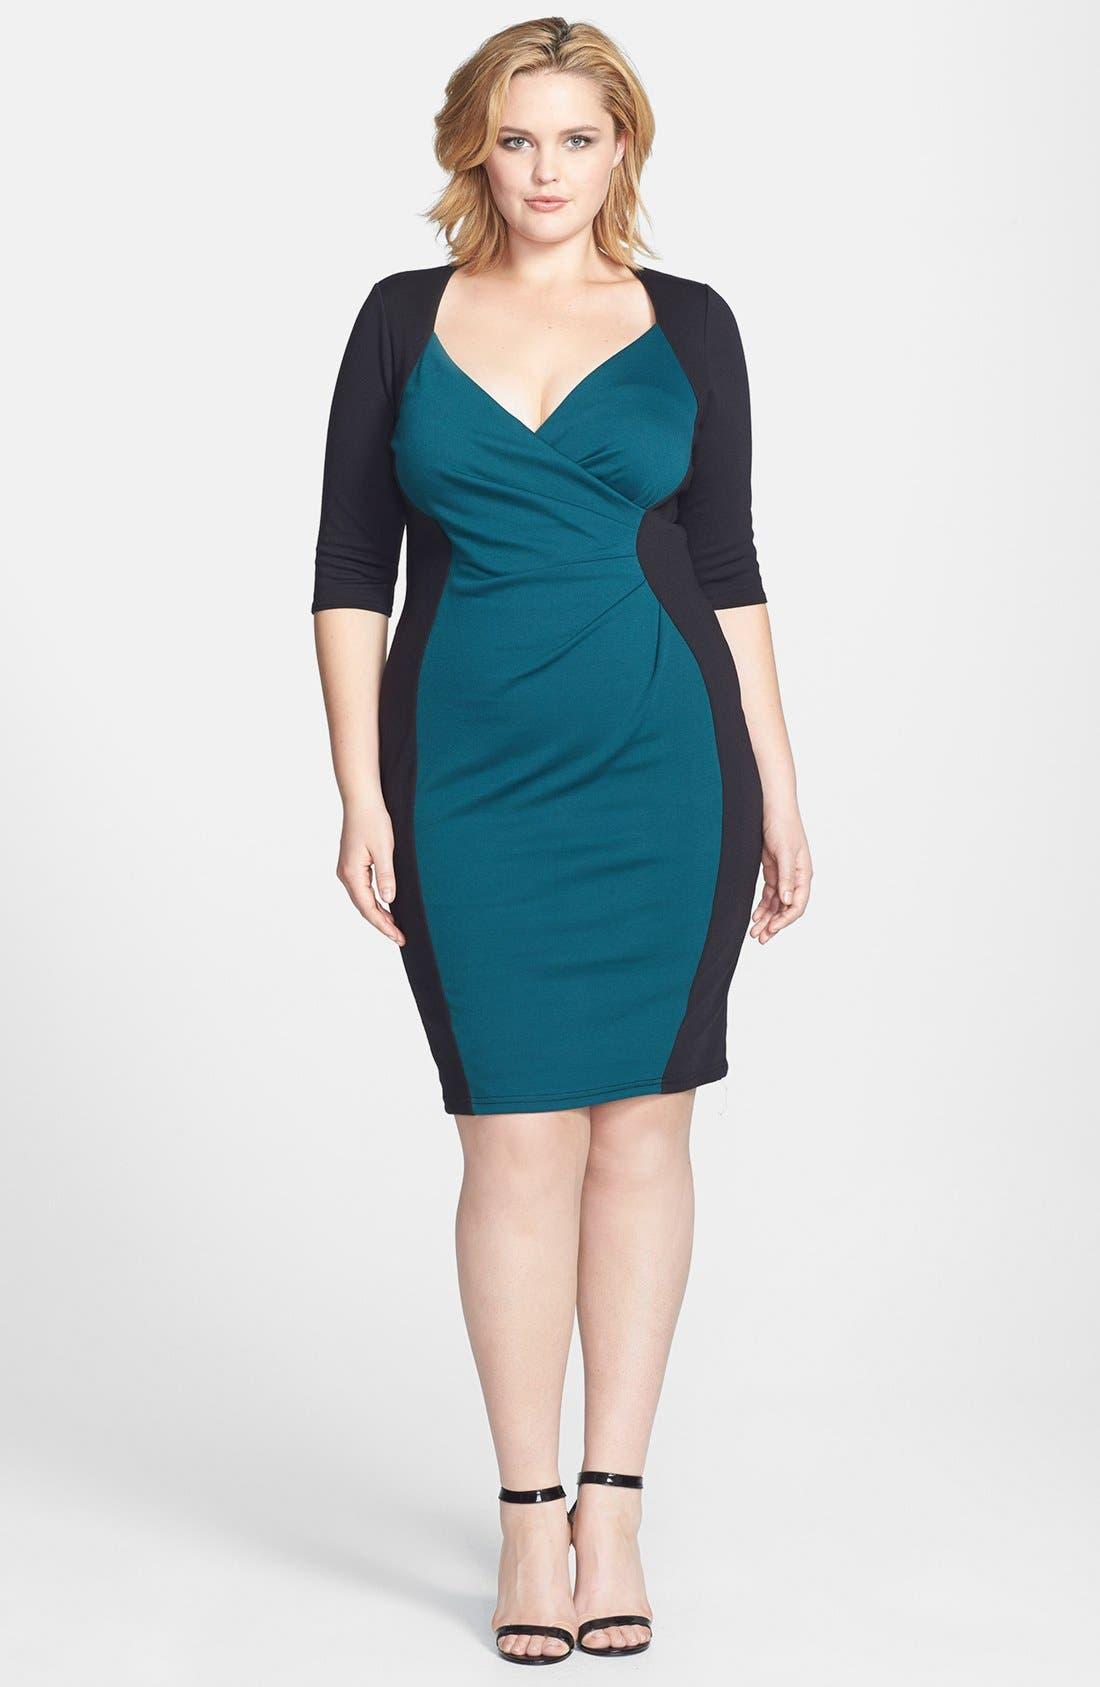 Alternate Image 1 Selected - Scarlett & Jo Colorblock Wrap Front Sheath Dress (Plus Size)